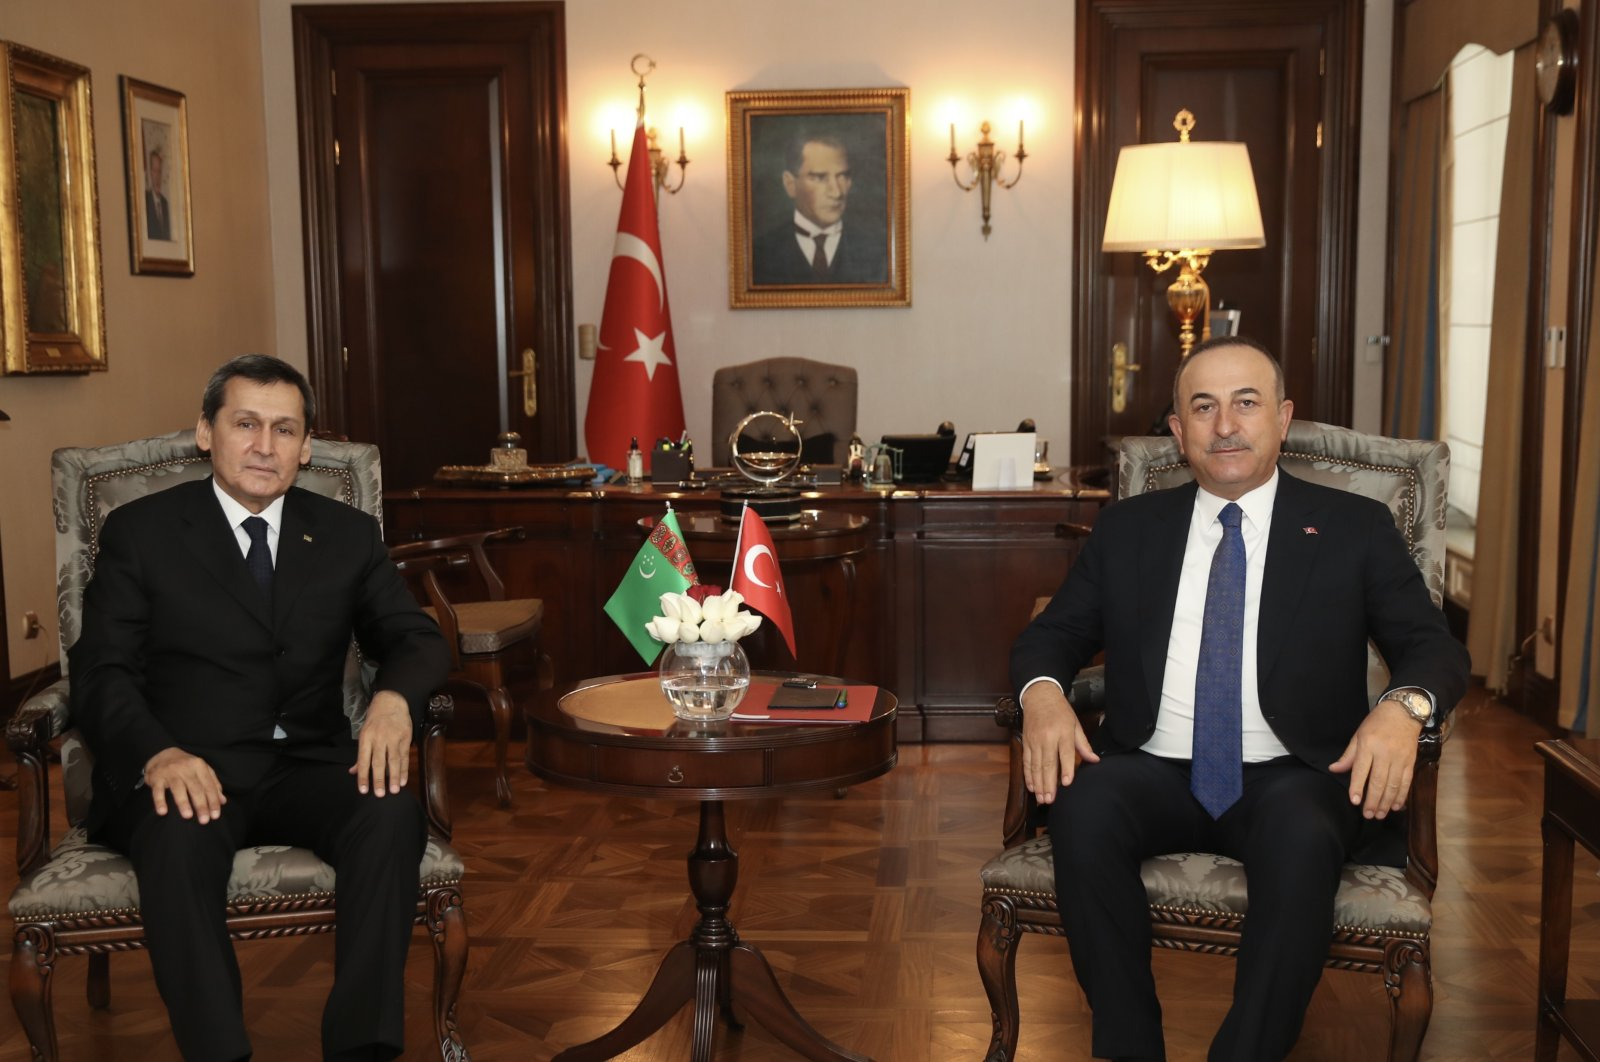 Foreign Minister Mevlüt Çavuşoğlu with his Turkmen counterpart Rashid Meredov in Ankara, Feb. 23, 2021. (AA Photo)